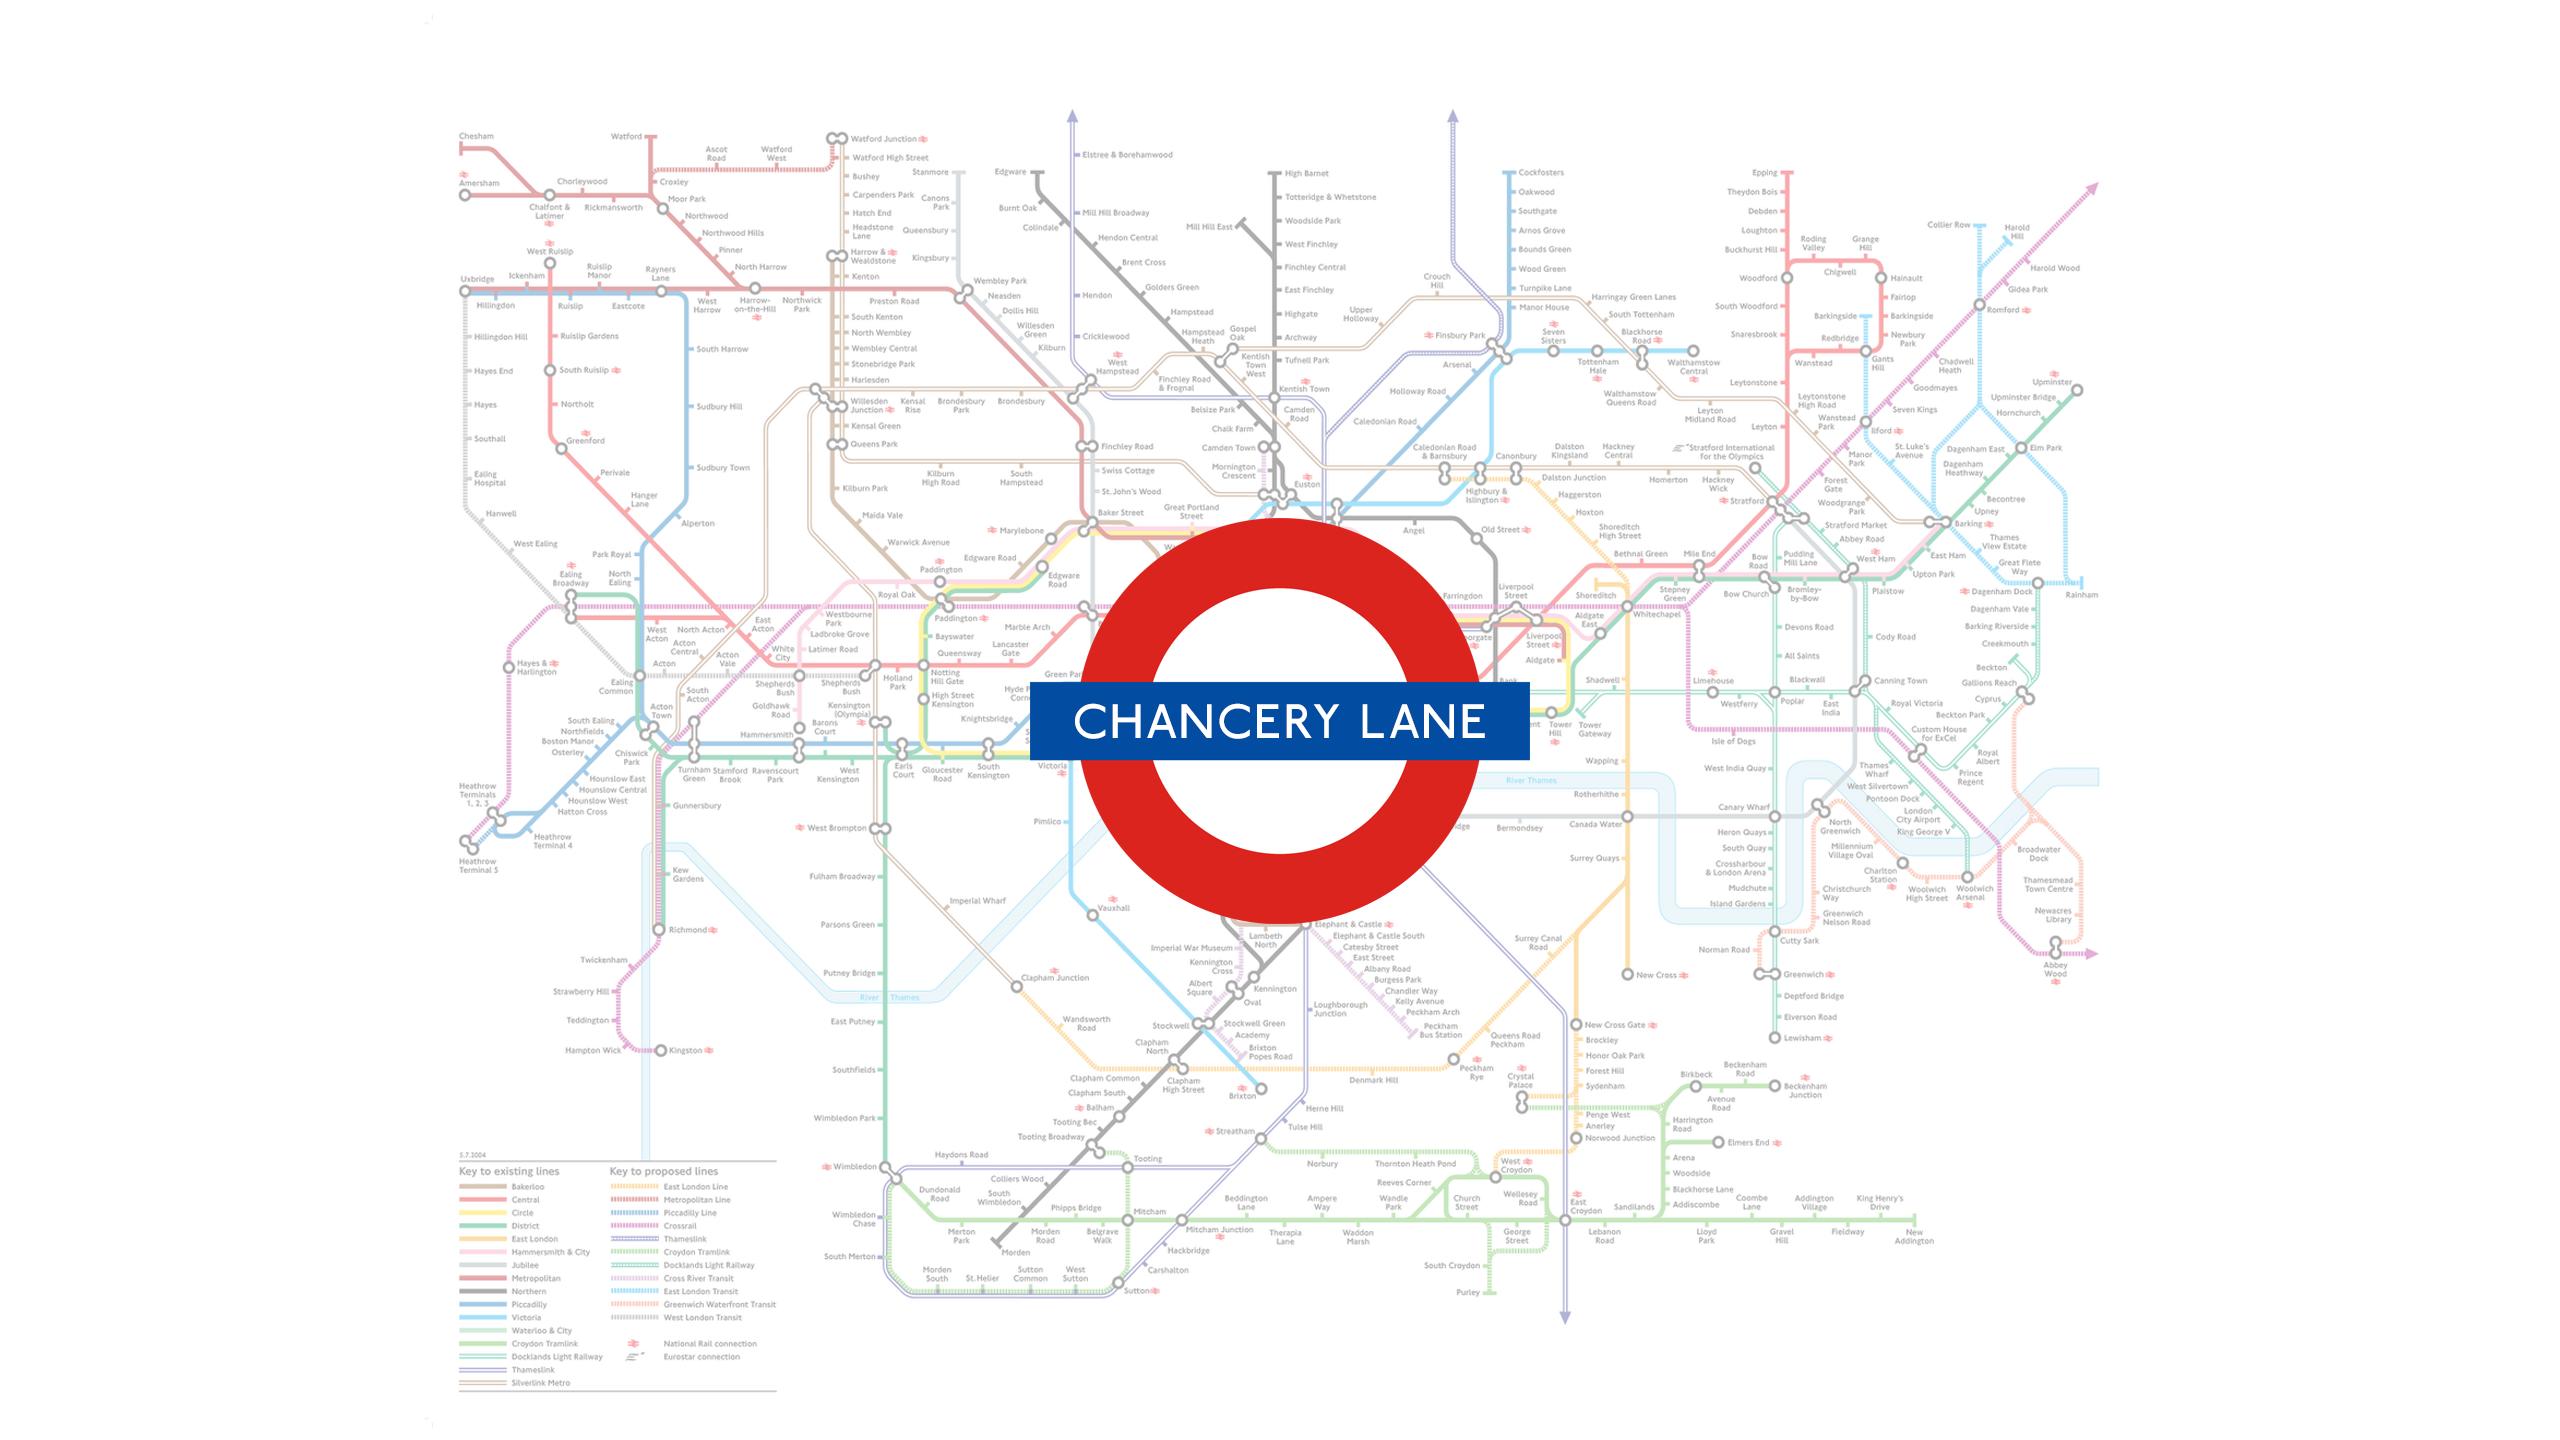 Chancery Lane (Map)